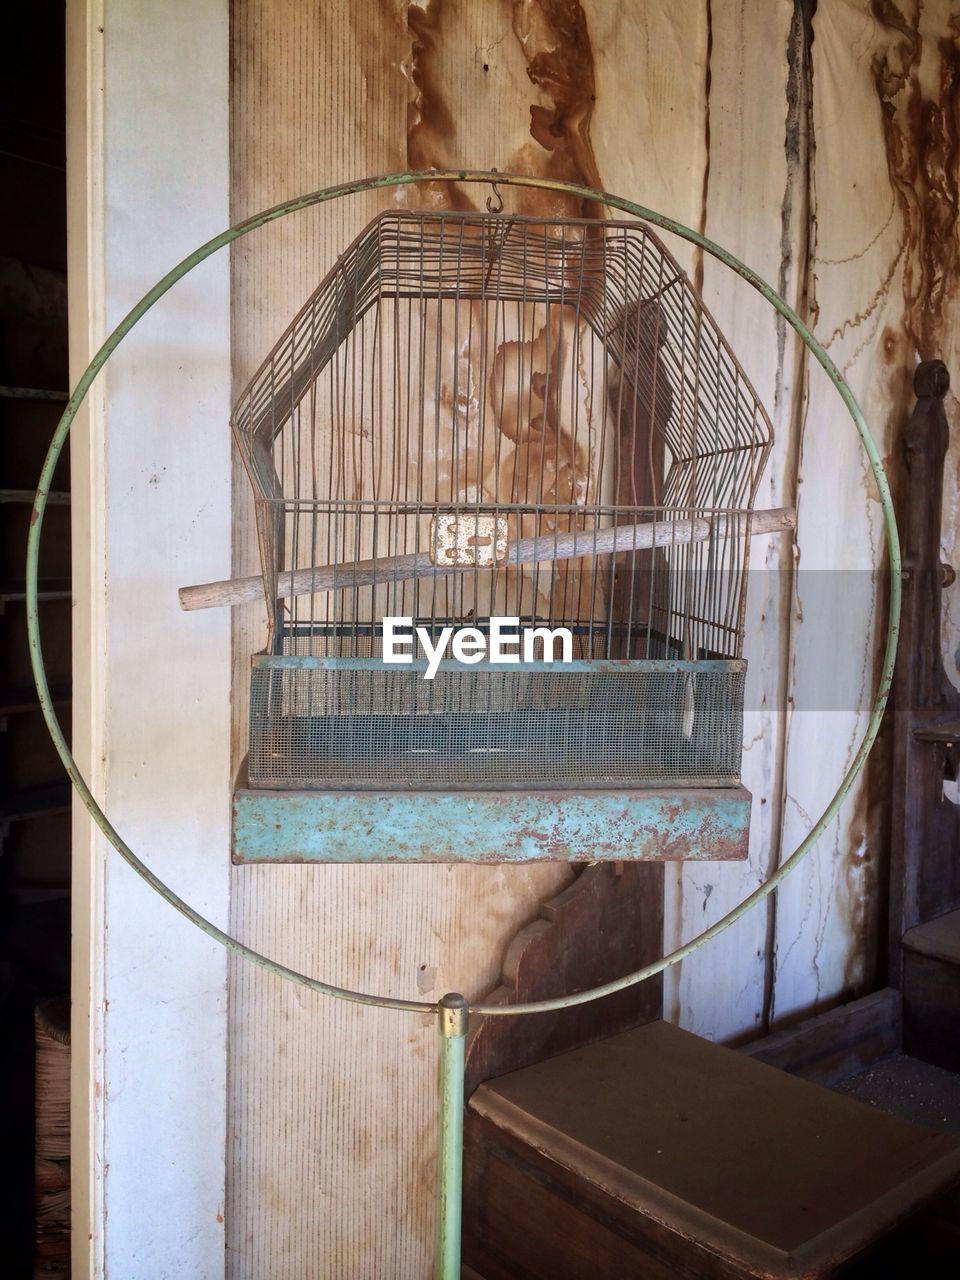 Close-up of a bird cage